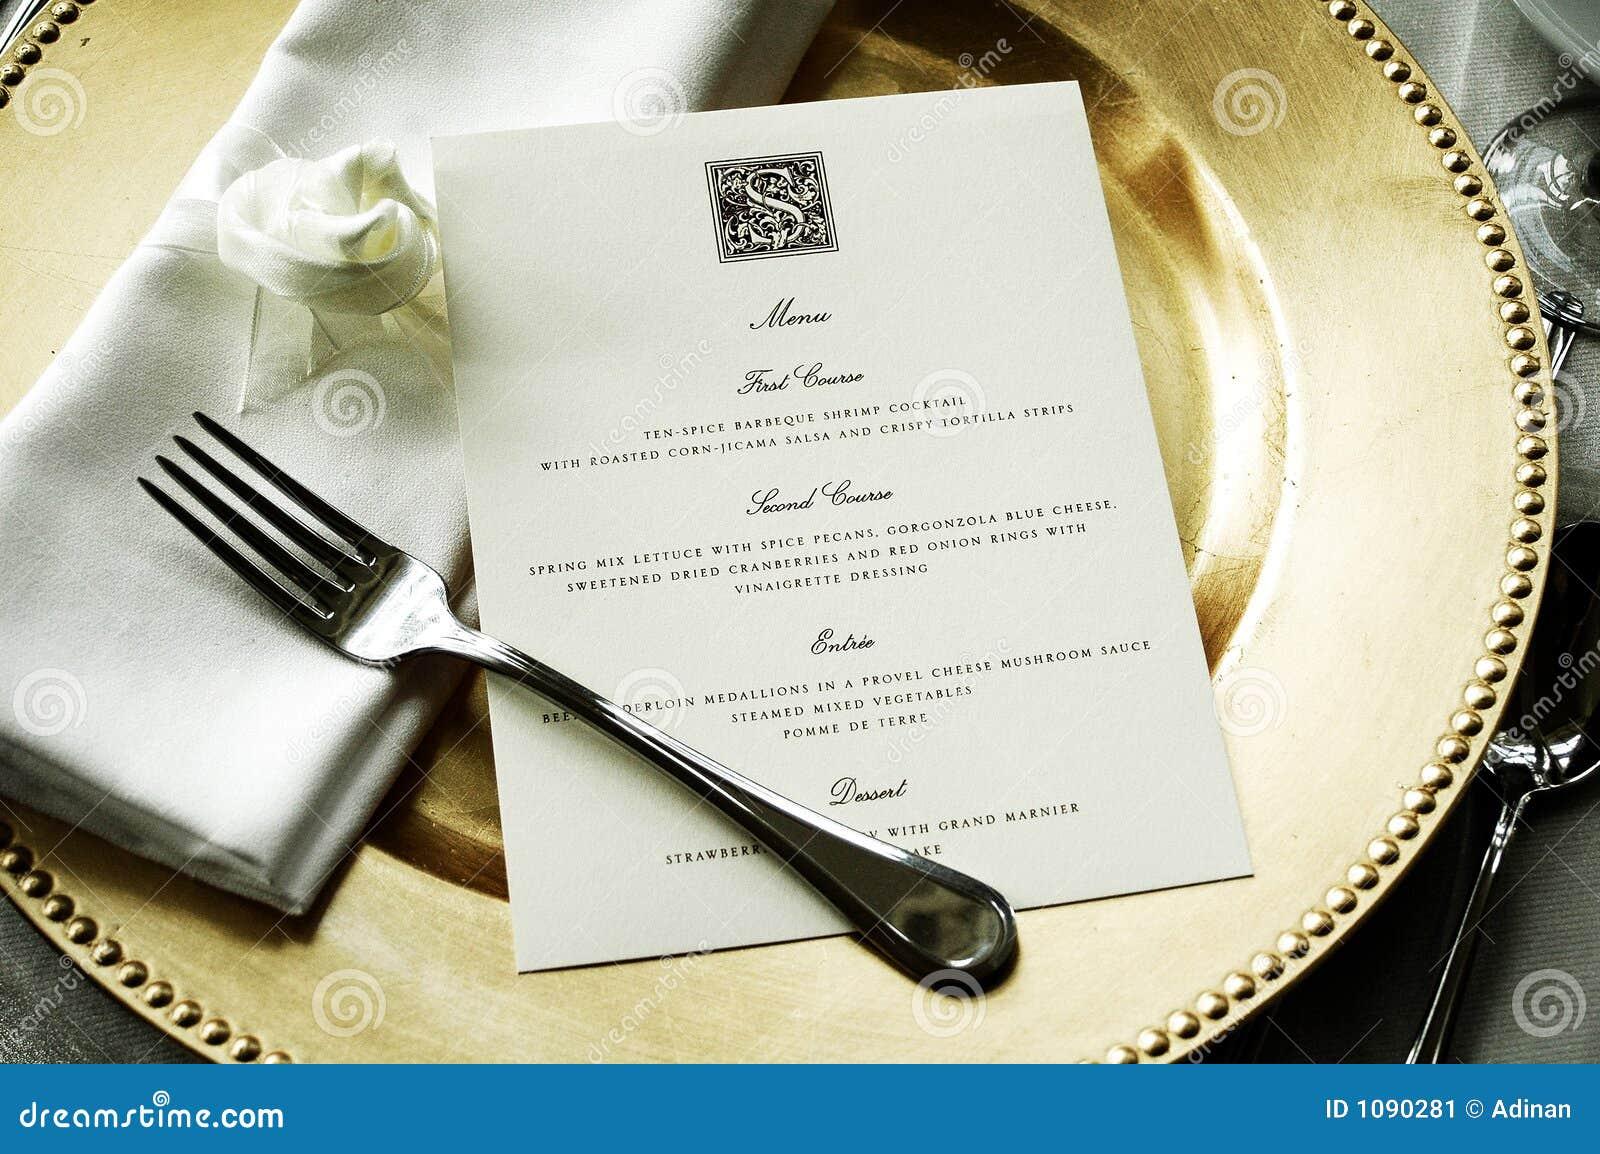 dinner menu stock image  image of dining  gold  wedding